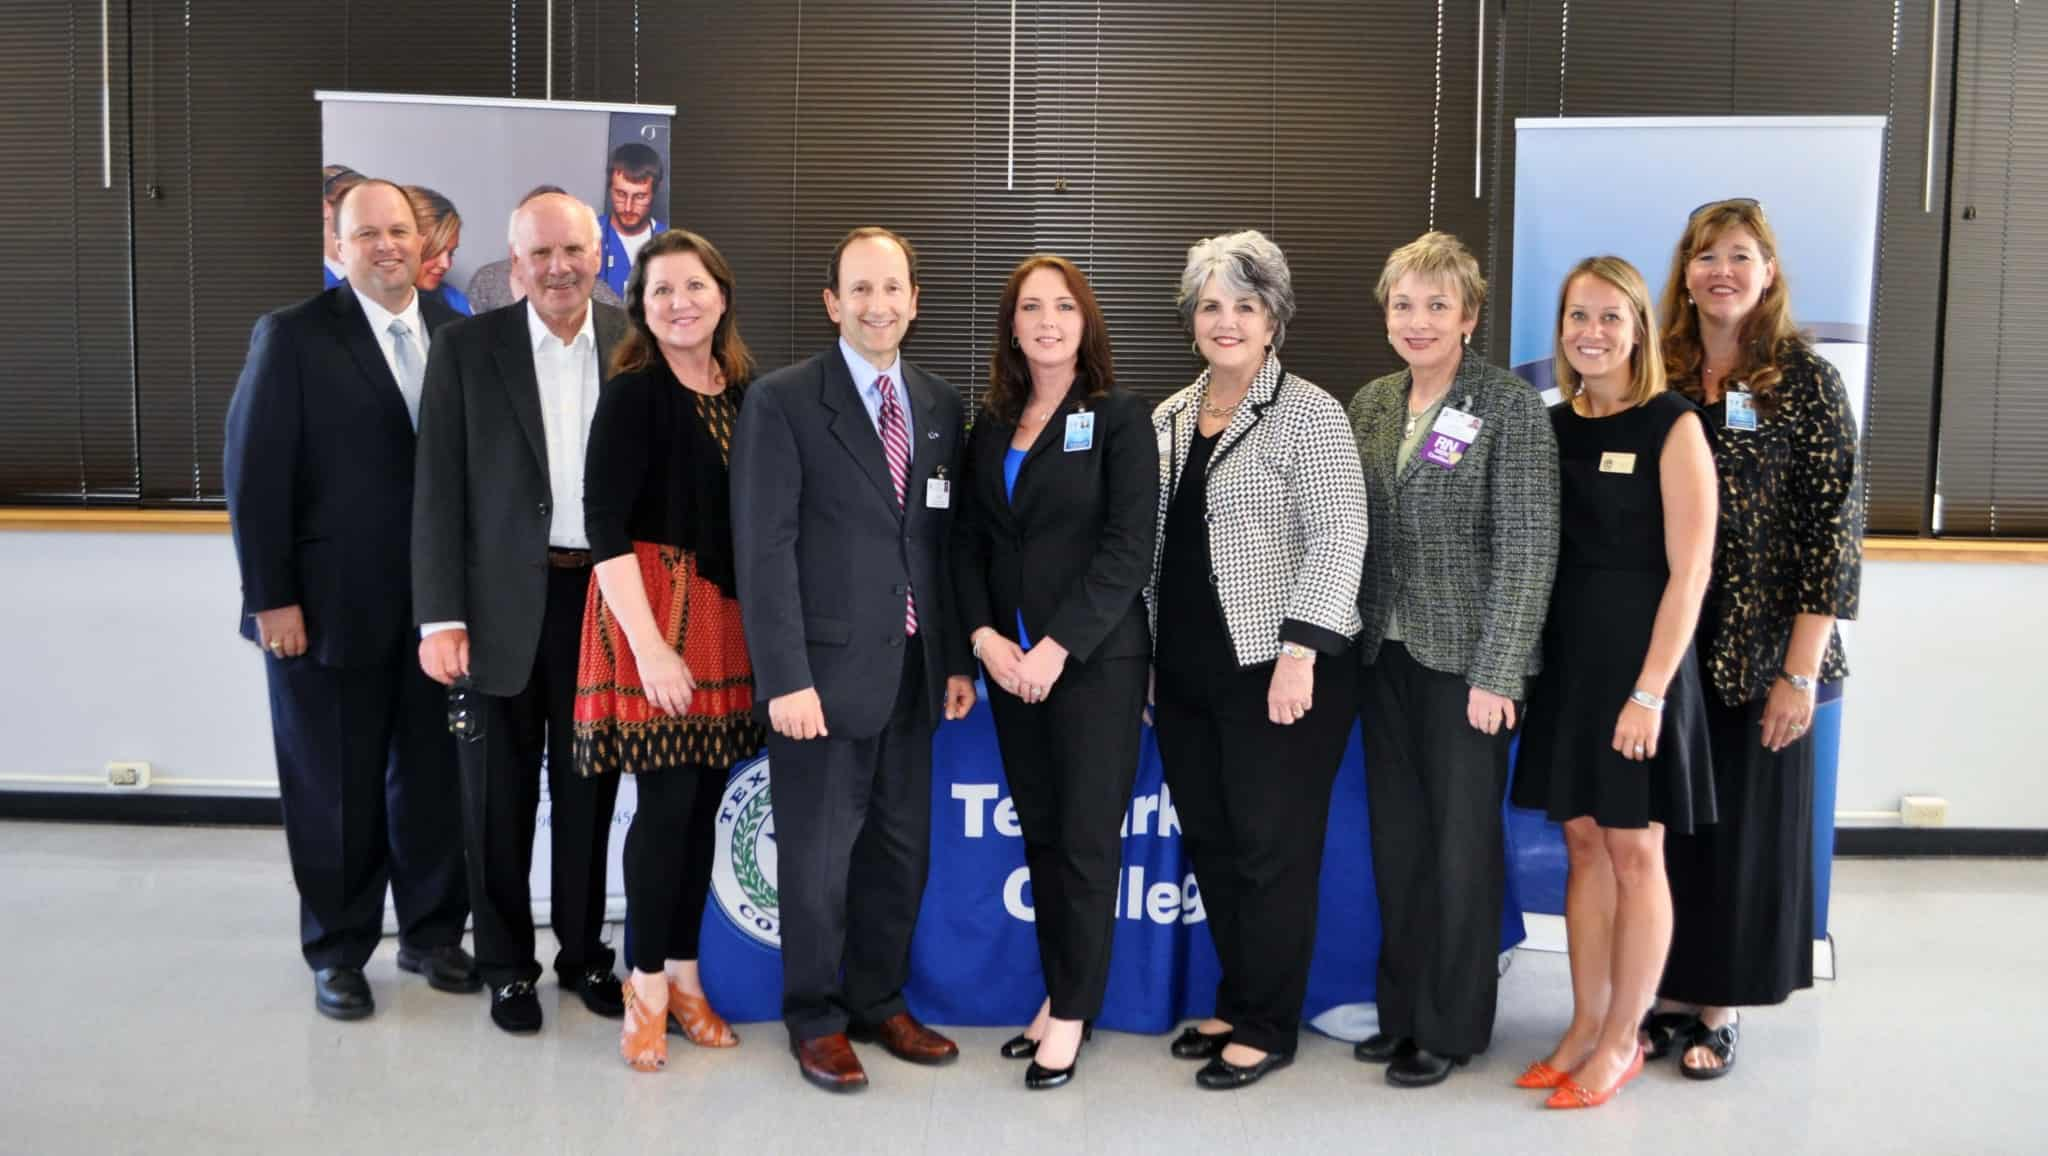 CHRISTUS St. Michael Foundation establishes new nursing scholarships